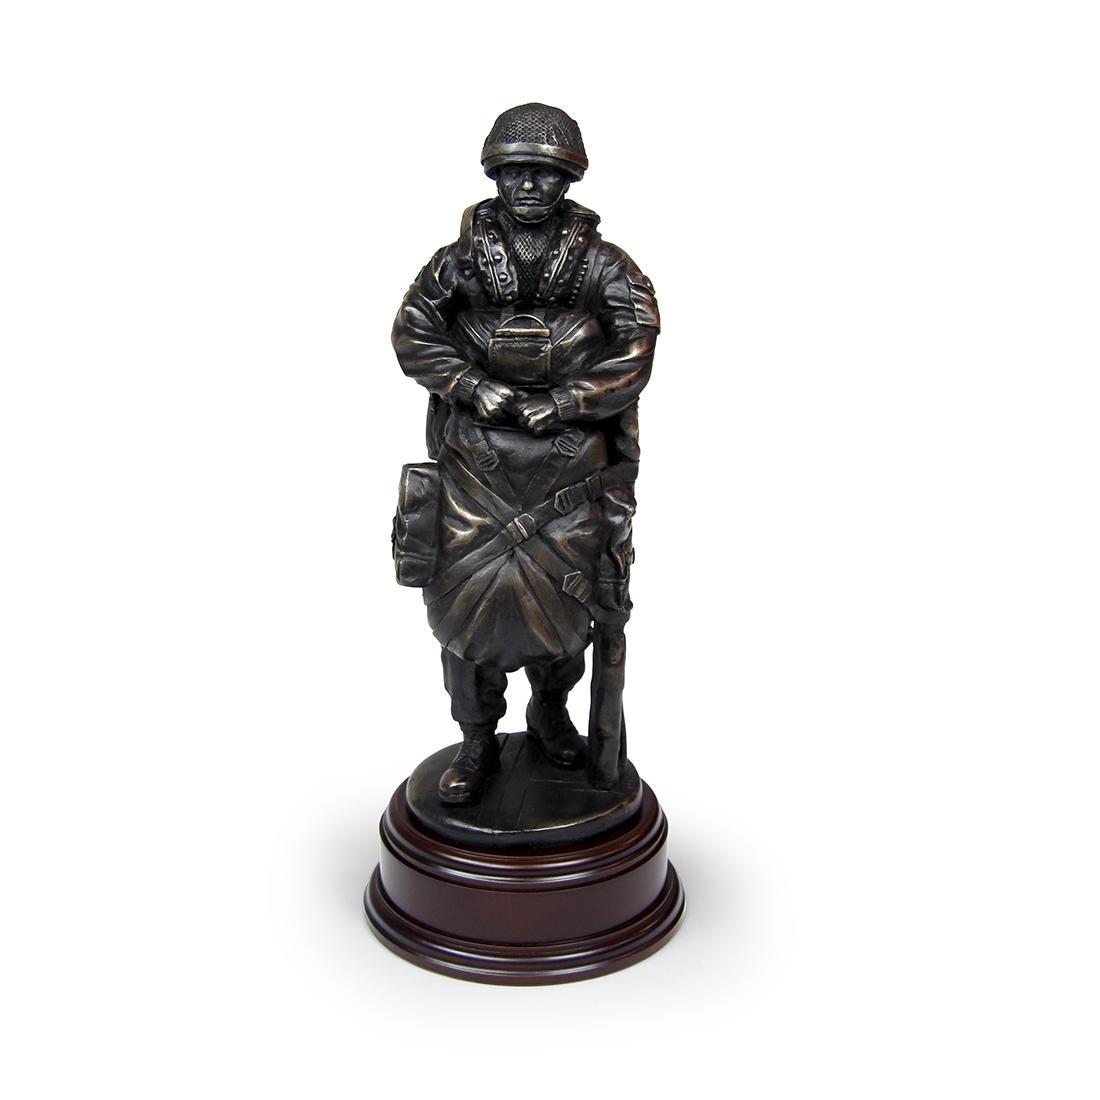 Drop Order PX4 Para Statue - Webbing SA80 Slung (Resin Bronze)